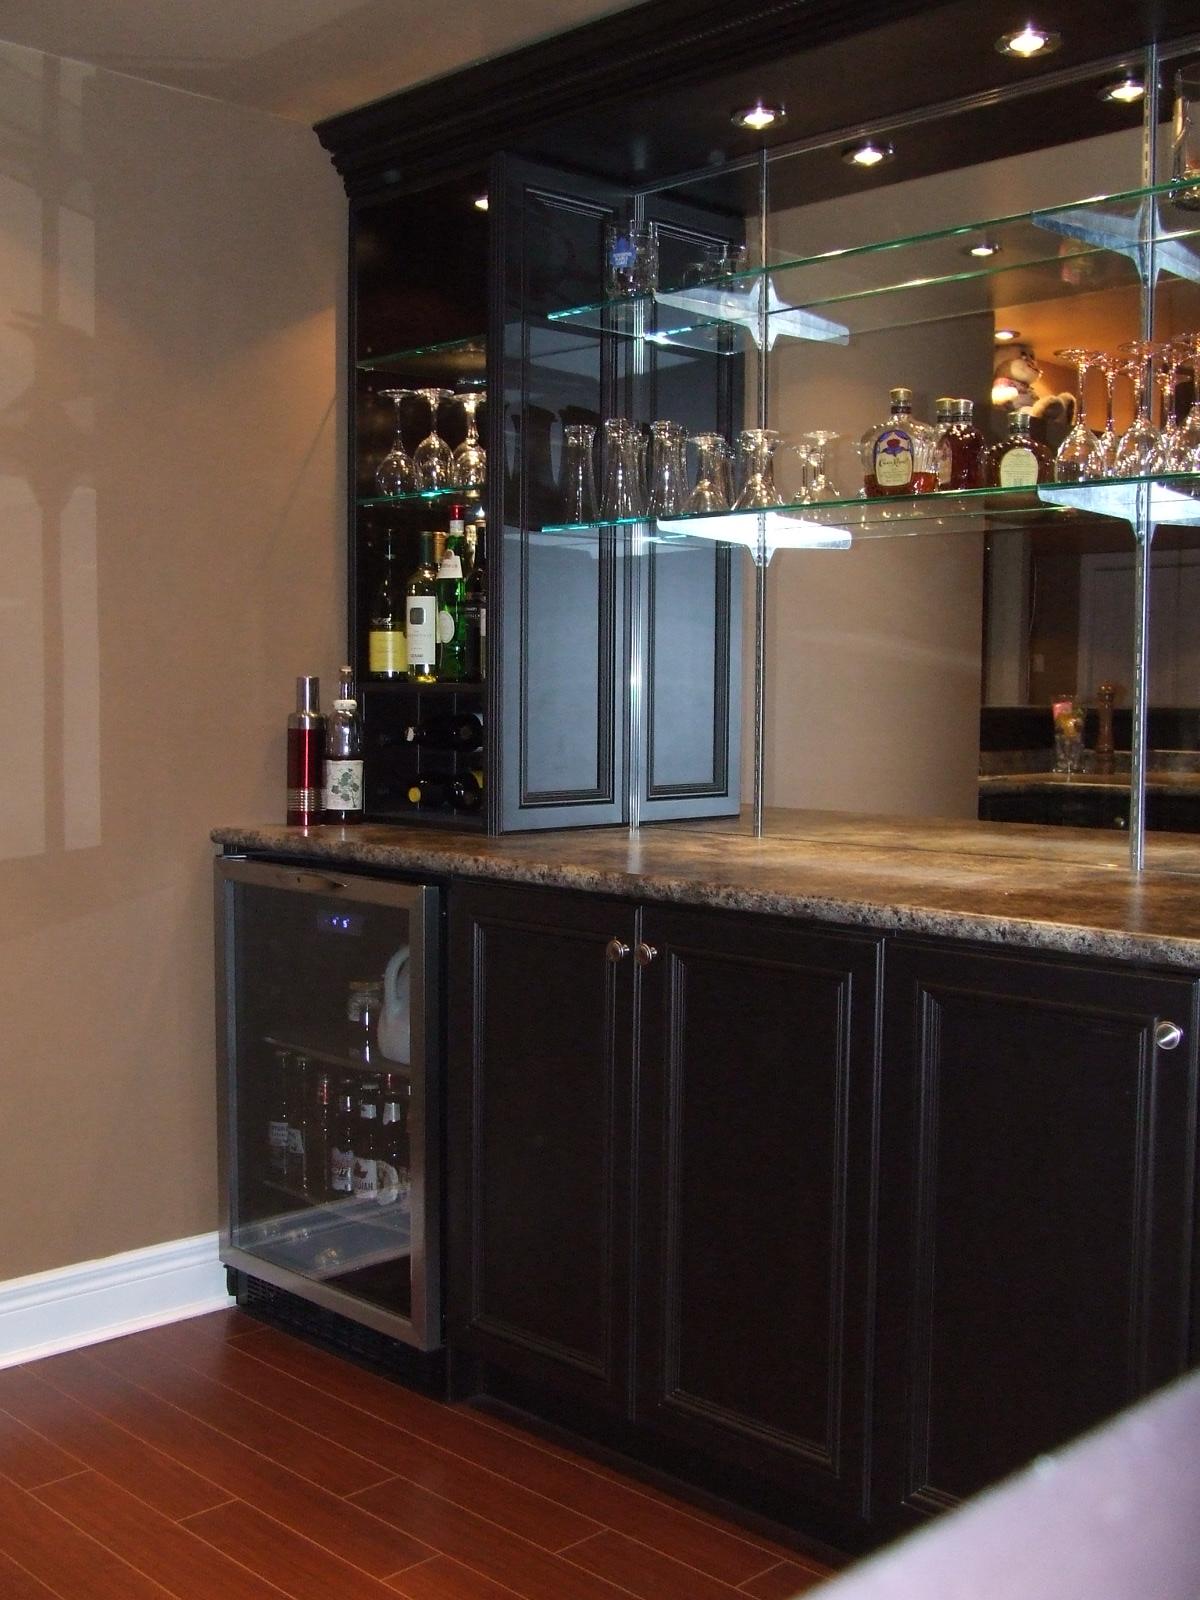 The Bar Sink Amp Dishwasher We Installed In Pauls Basement